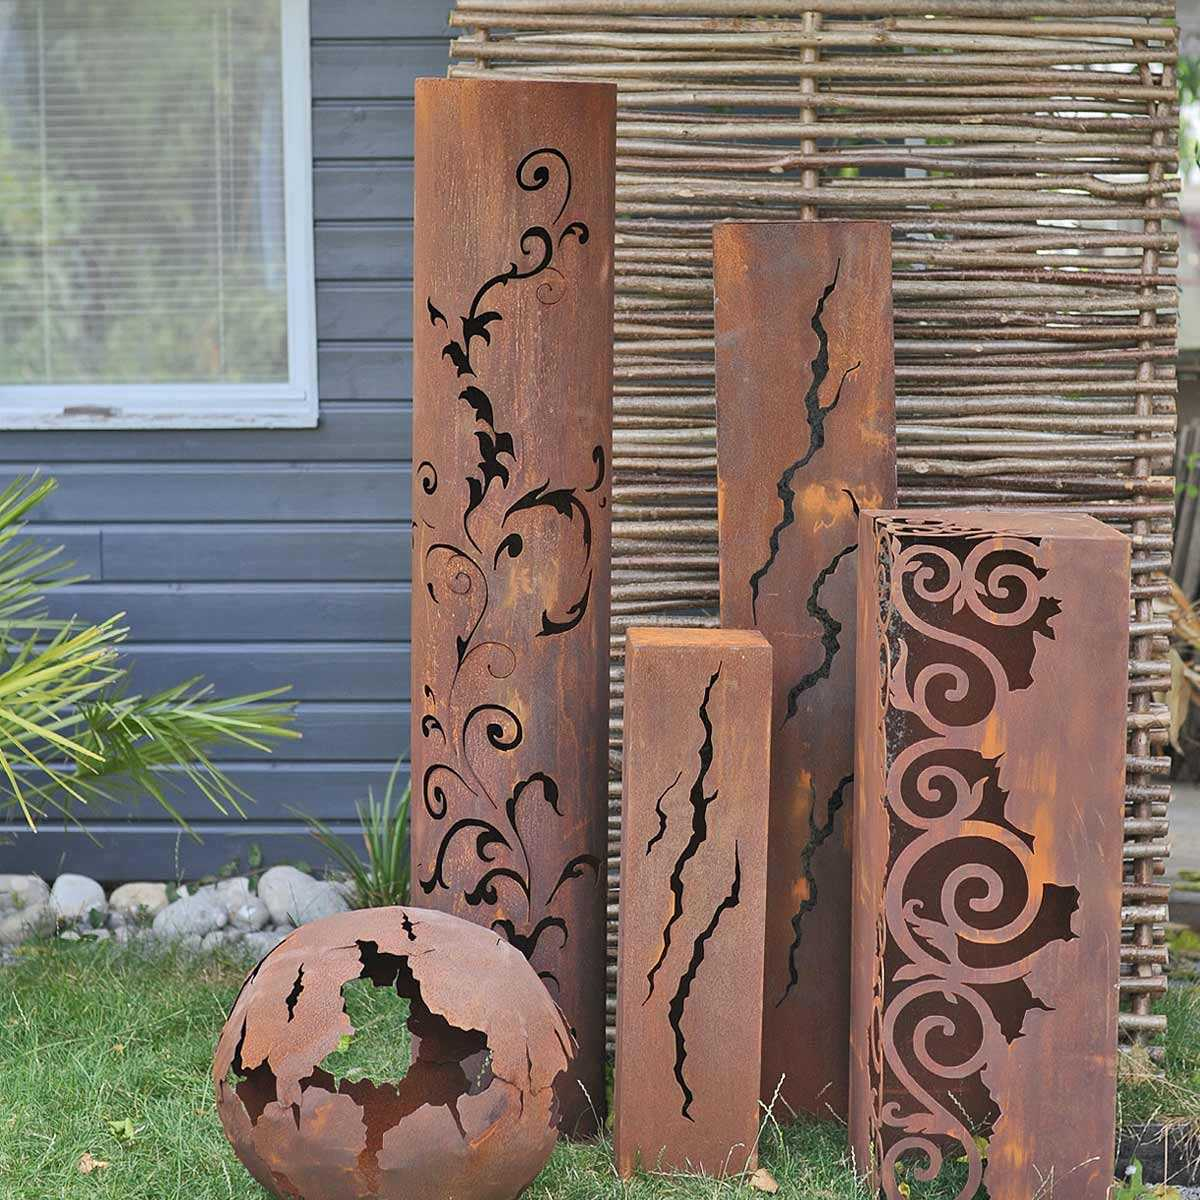 Image abri de jardin en metal galvanise décoration jardin ...